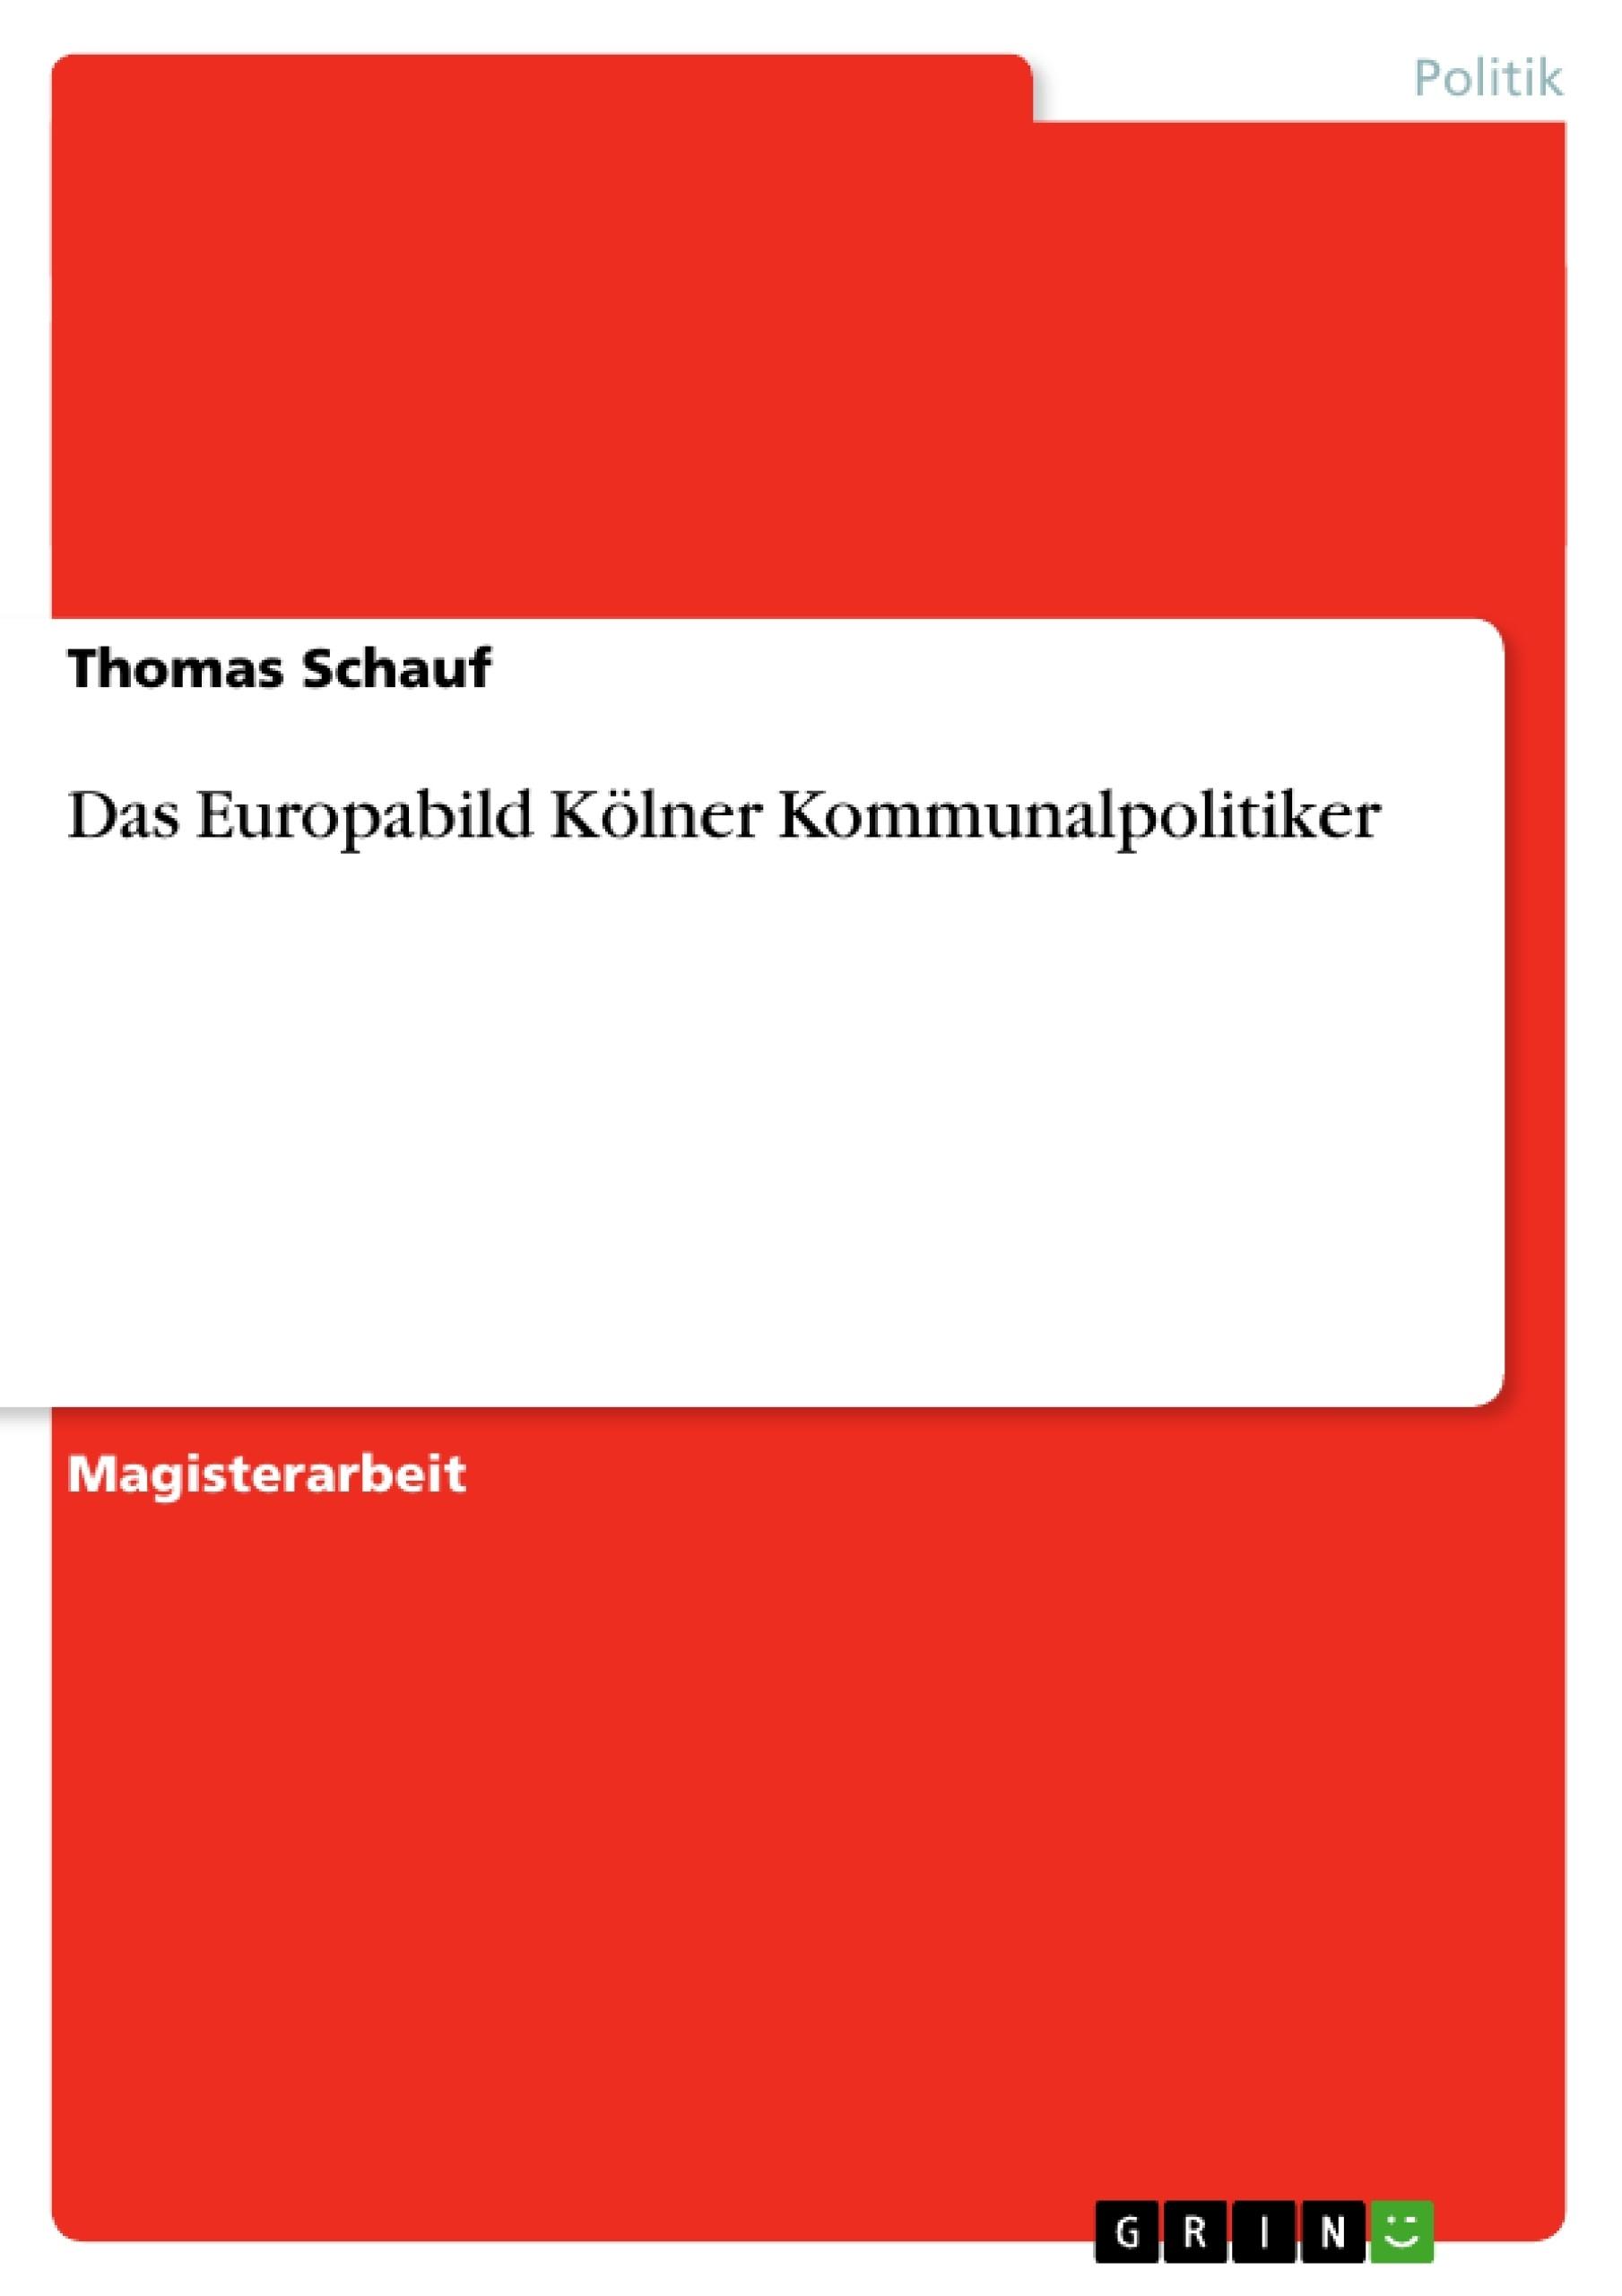 Titel: Das Europabild Kölner Kommunalpolitiker